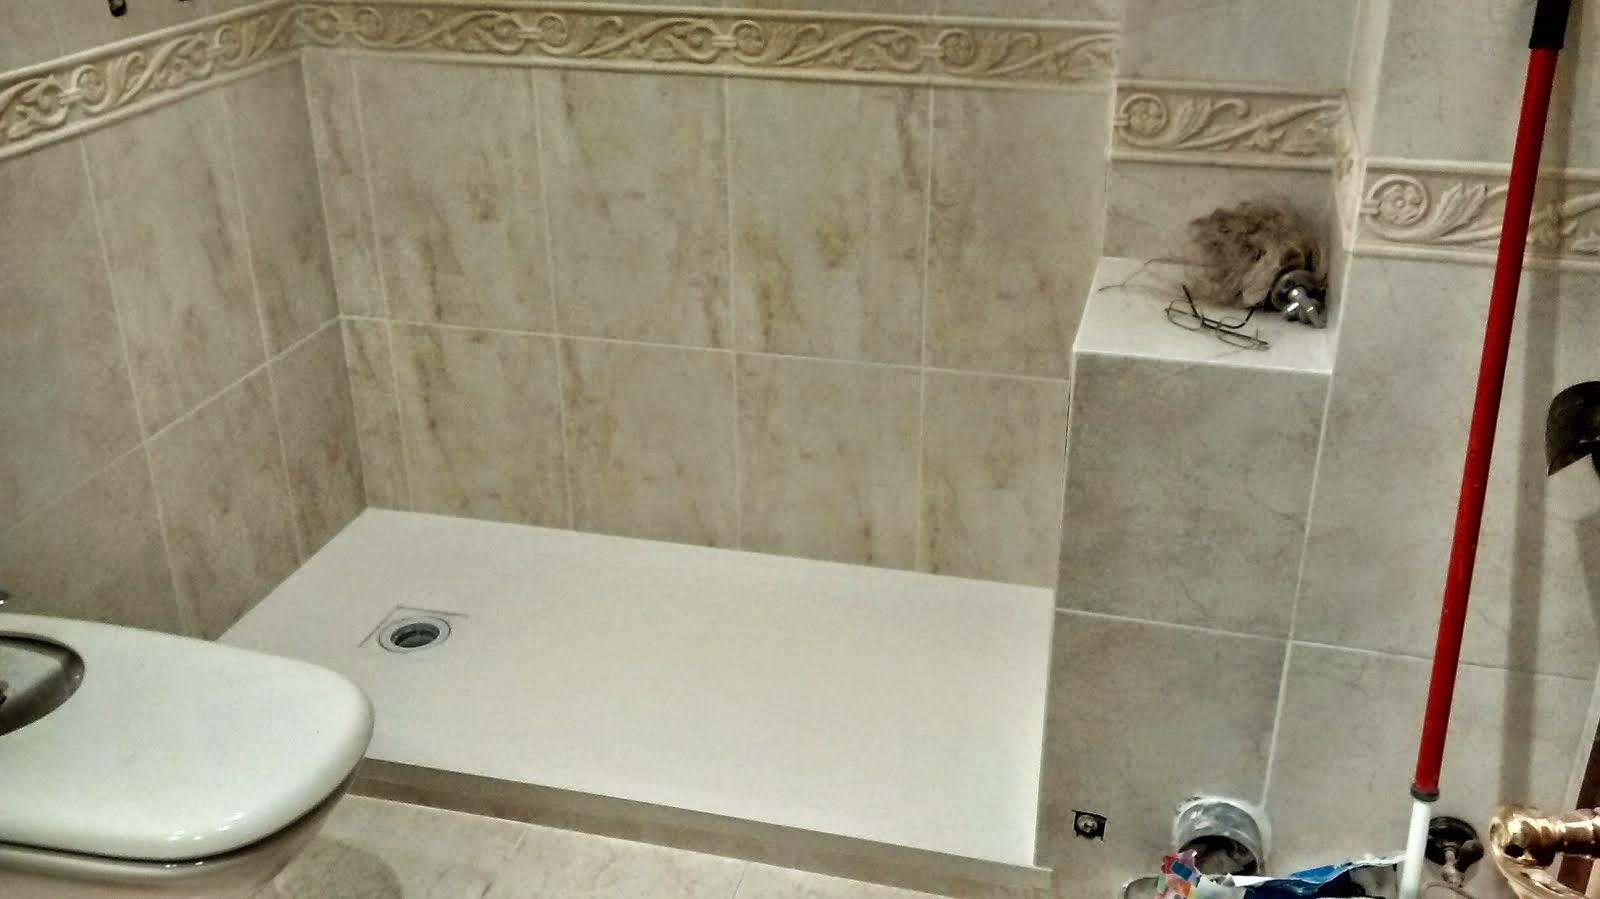 Baldosassa fotos e imagenes de platos de ducha for Instalar plato ducha resina